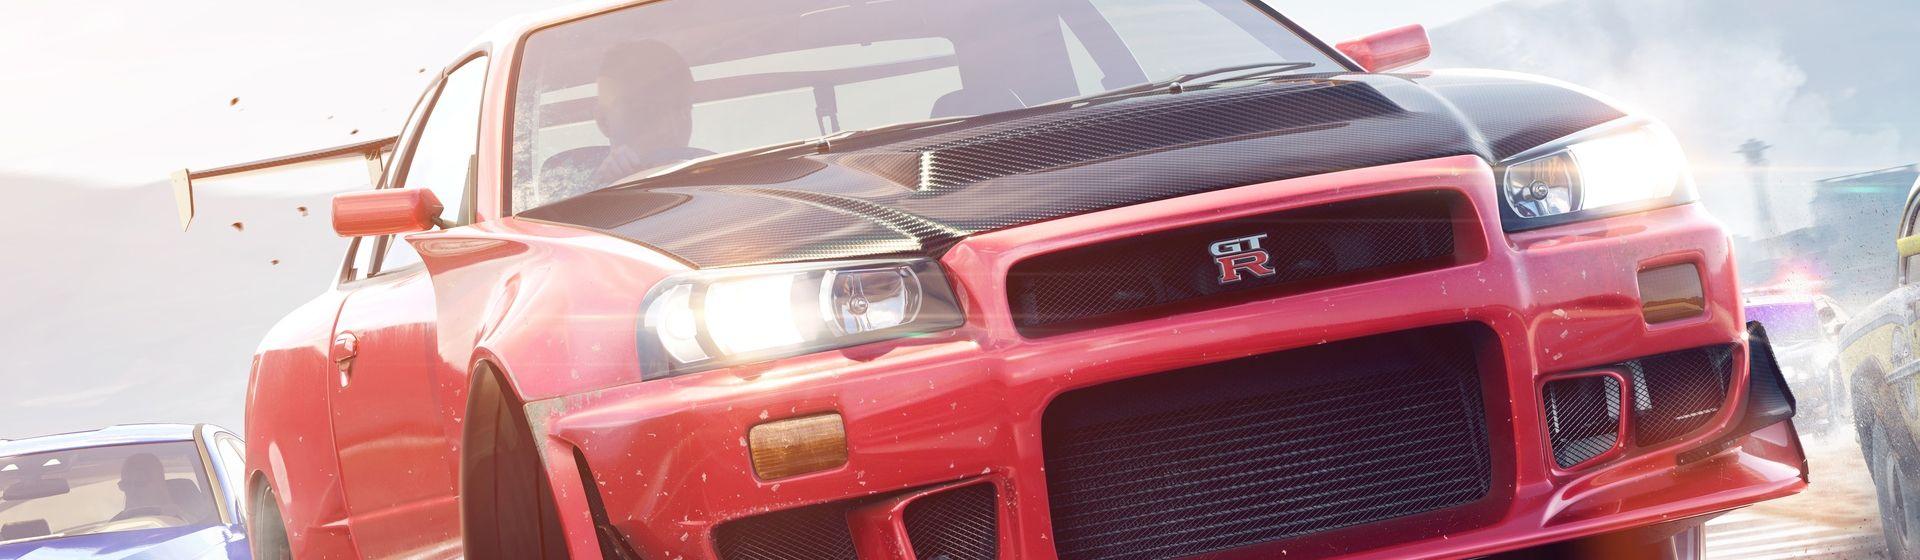 PS Plus de outubro tem Vampyr e Need For Speed: Payback como jogos grátis